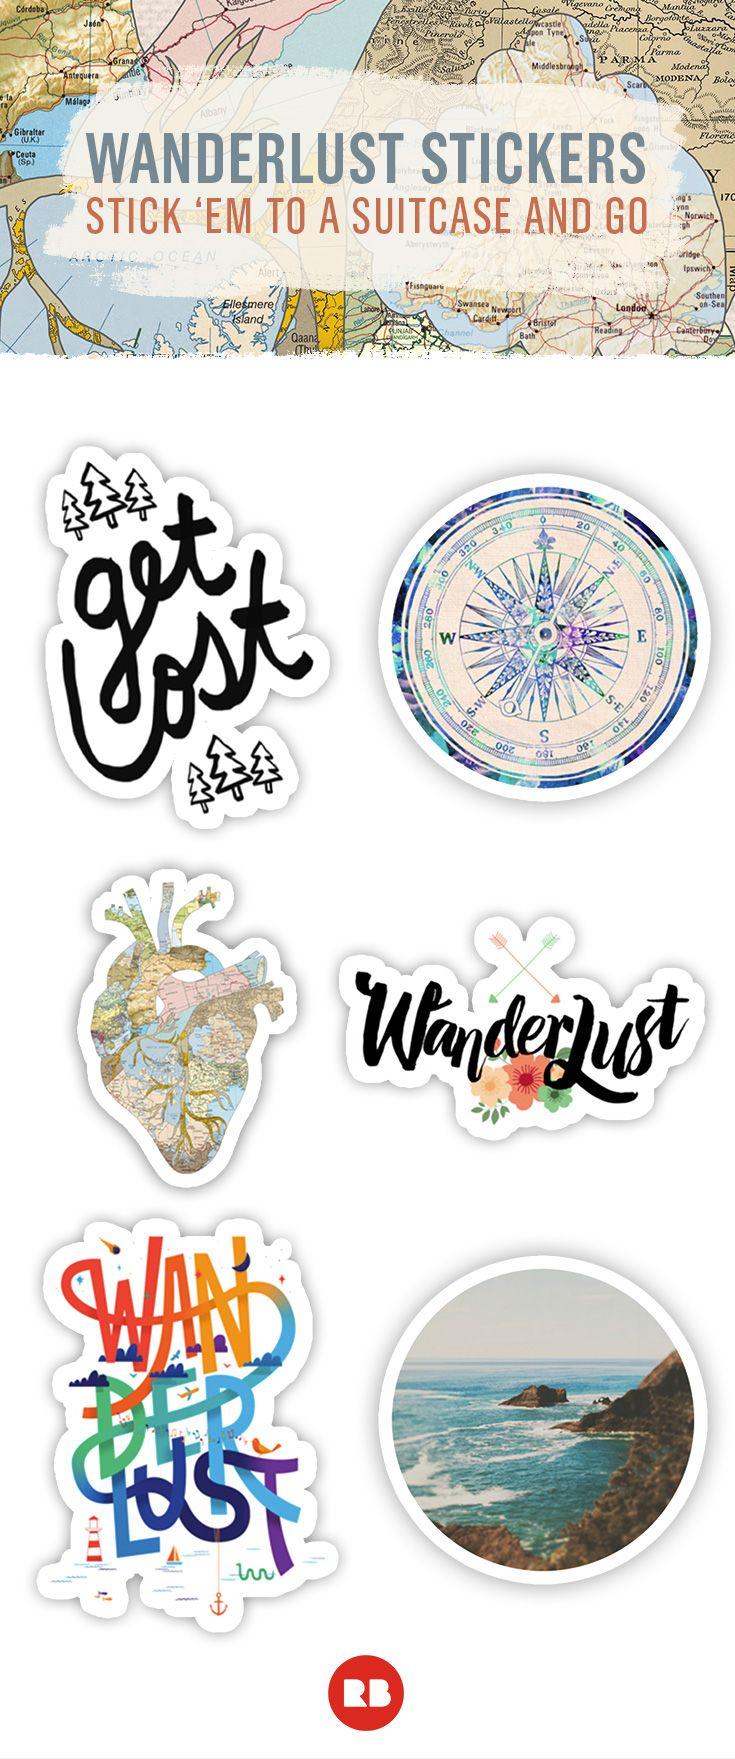 Wanderlust Stickers Fun Textiles And Graphics Pinterest Ideer